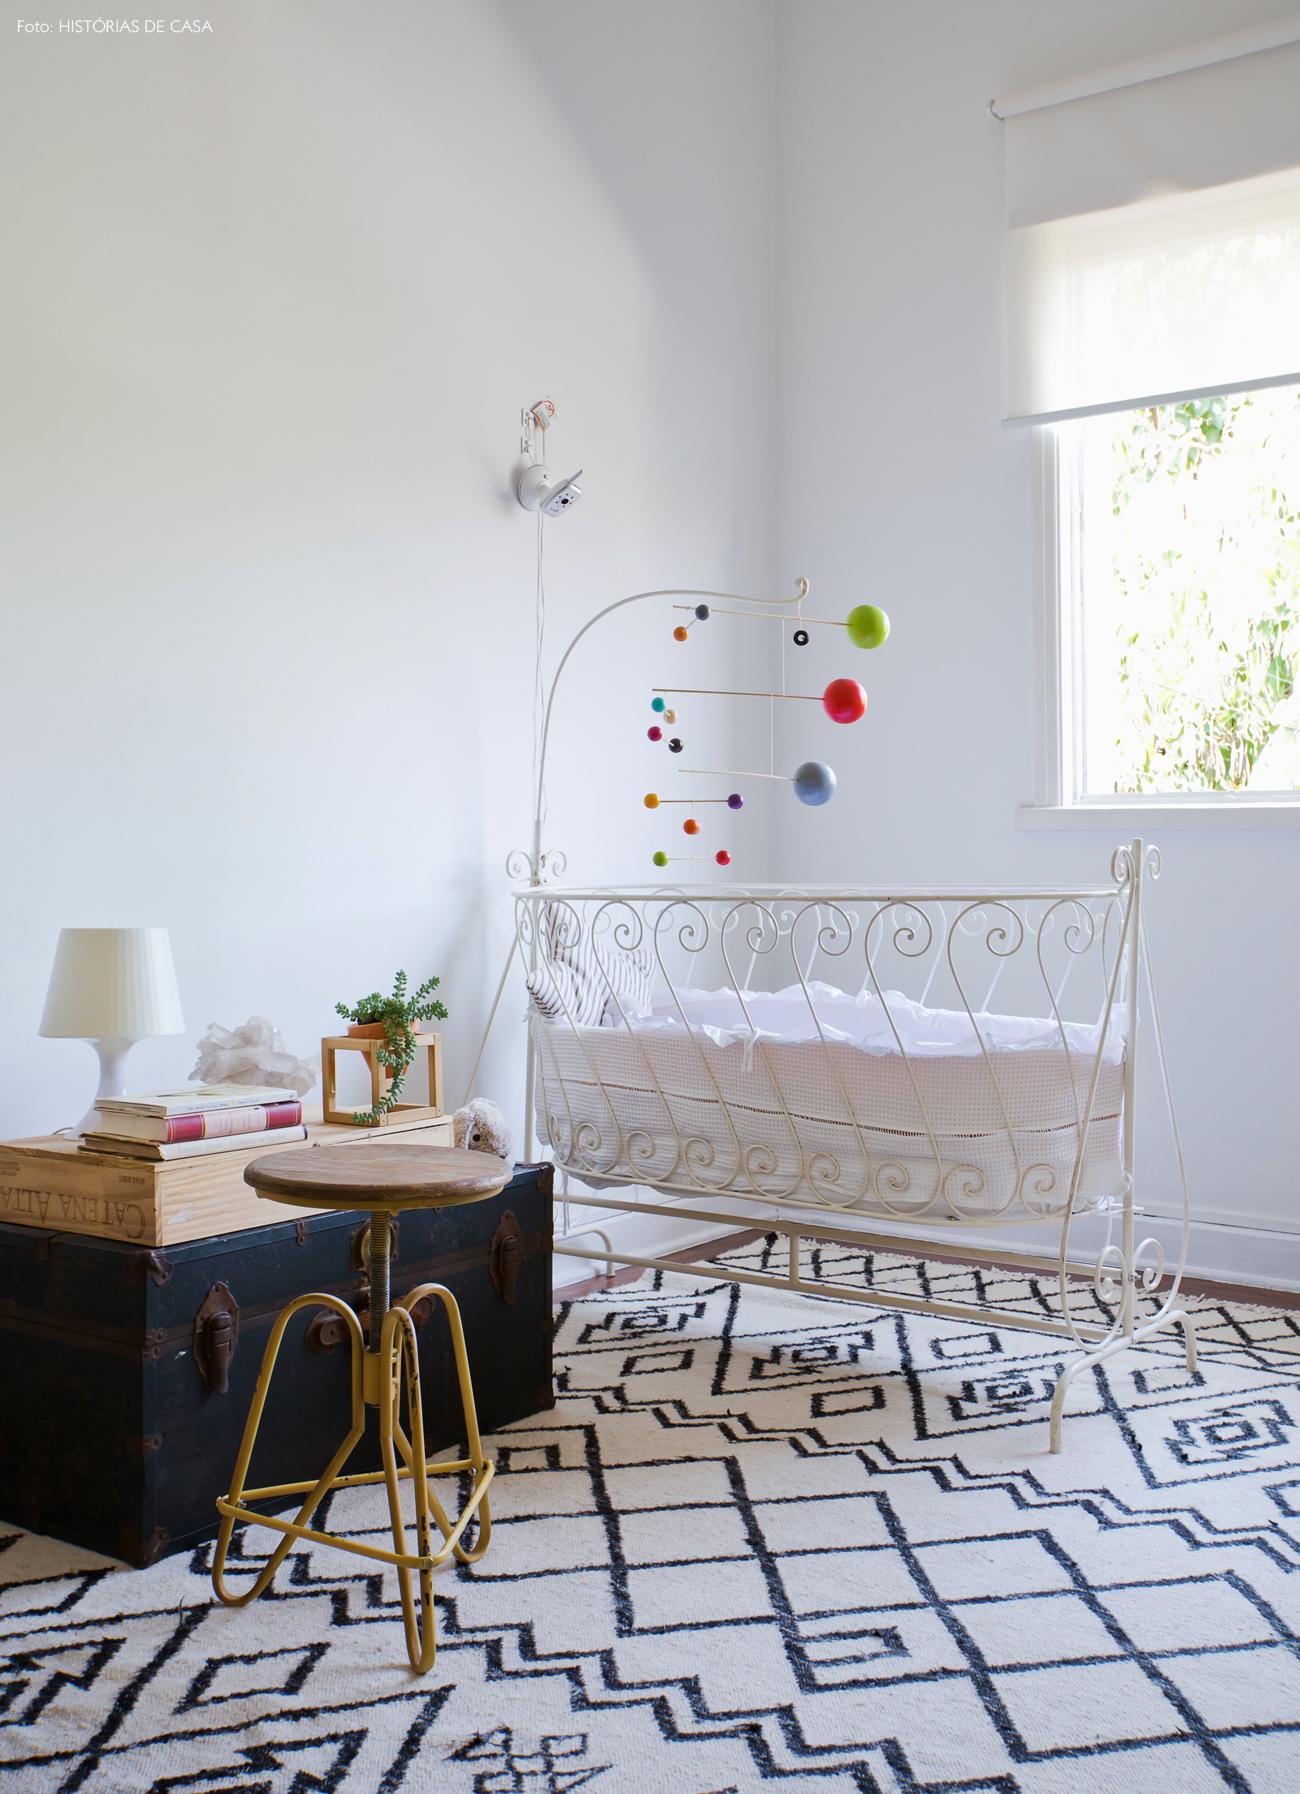 31-decoracao-quarto-bebe-tons-neutros-tapete-estampado-pb